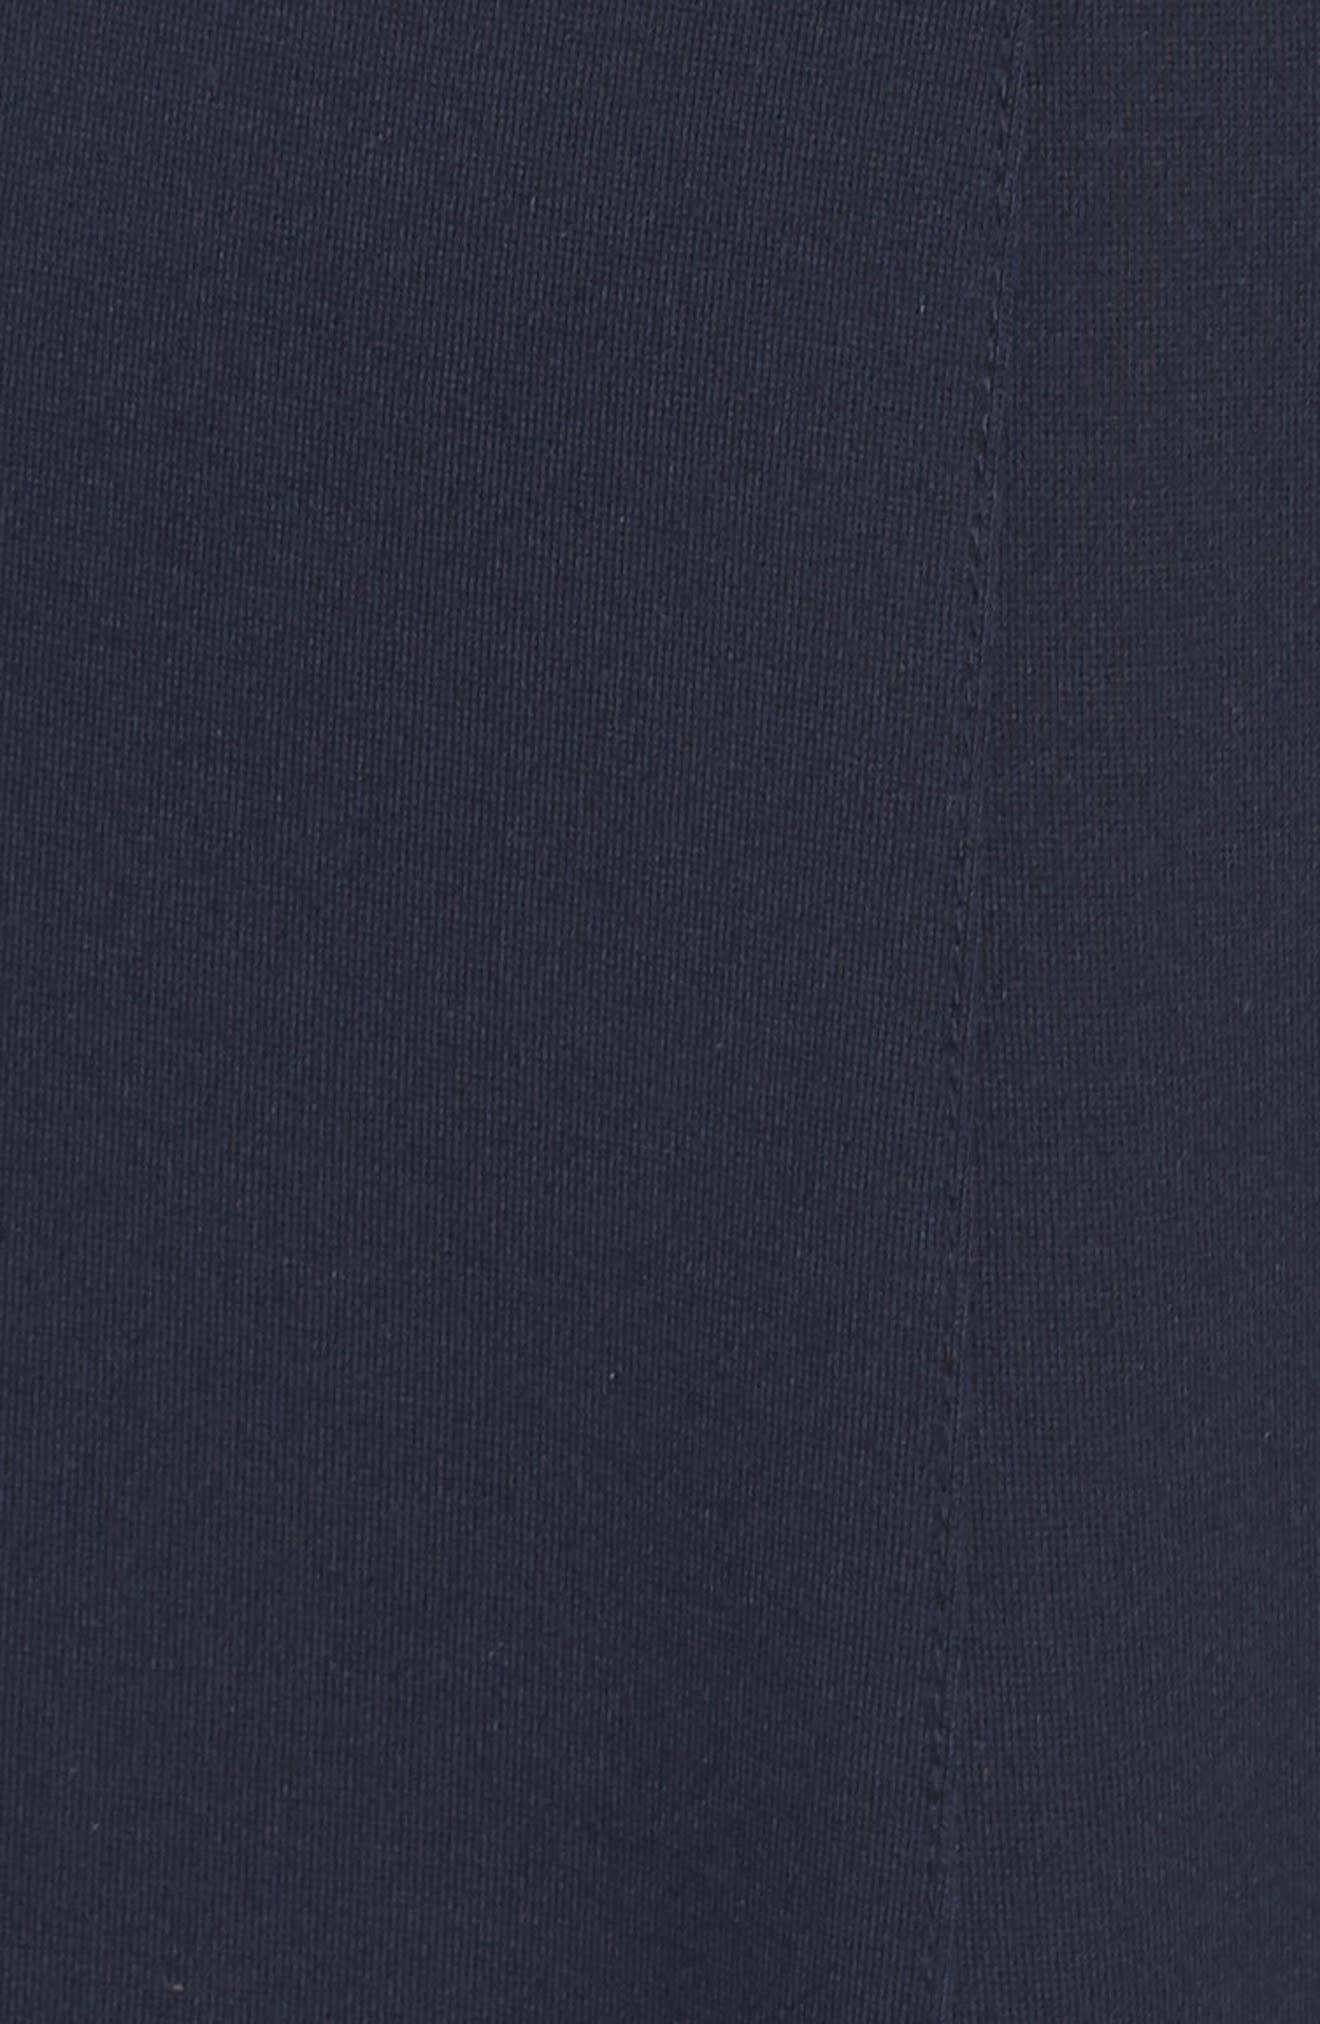 Hazel Lace Trim V-Neck Dress,                             Alternate thumbnail 5, color,                             Midnight Blue/ Black